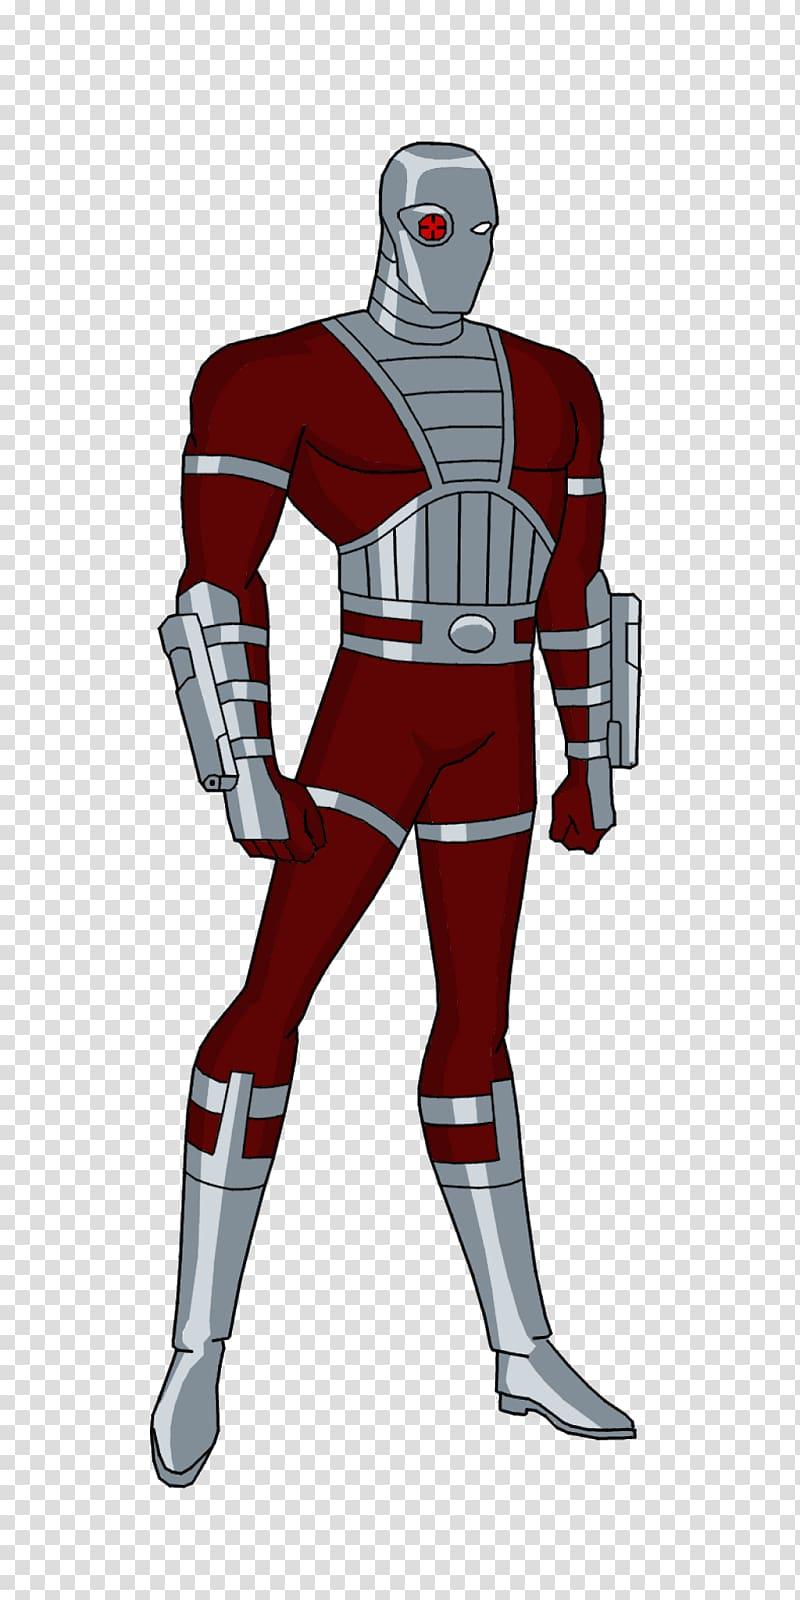 Robin superhero clipart image royalty free Deadshot Captain Atom Robin Superhero The New 52, robin ... image royalty free